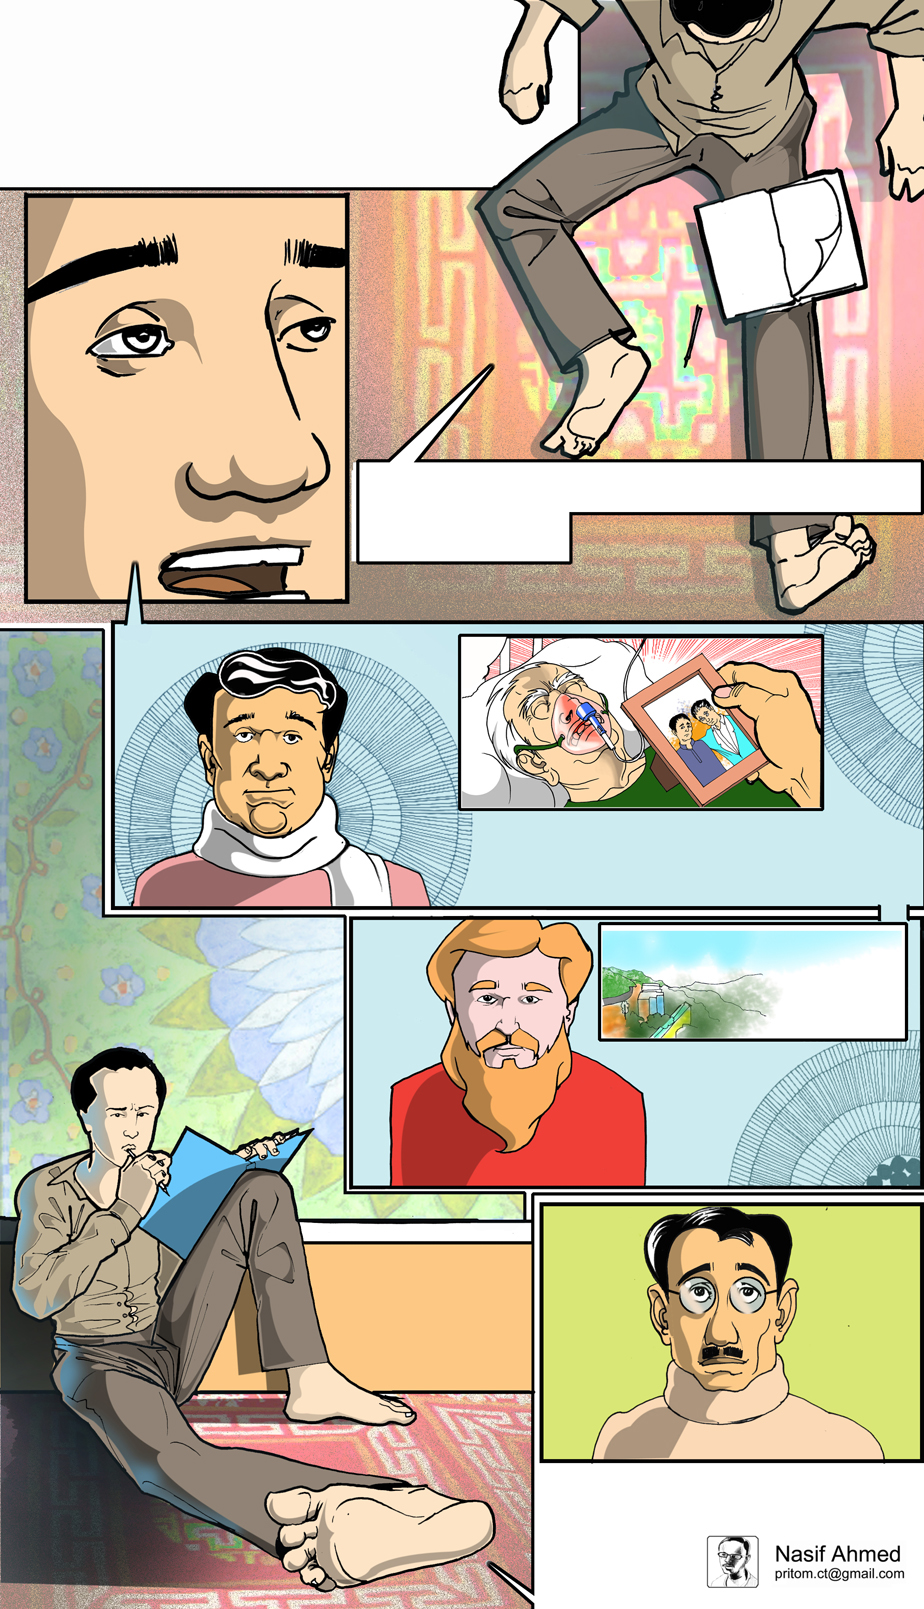 feluda comics graphicnovel gangtok SIKKIM gagtoke gondogol nasifahmed nasif pritom